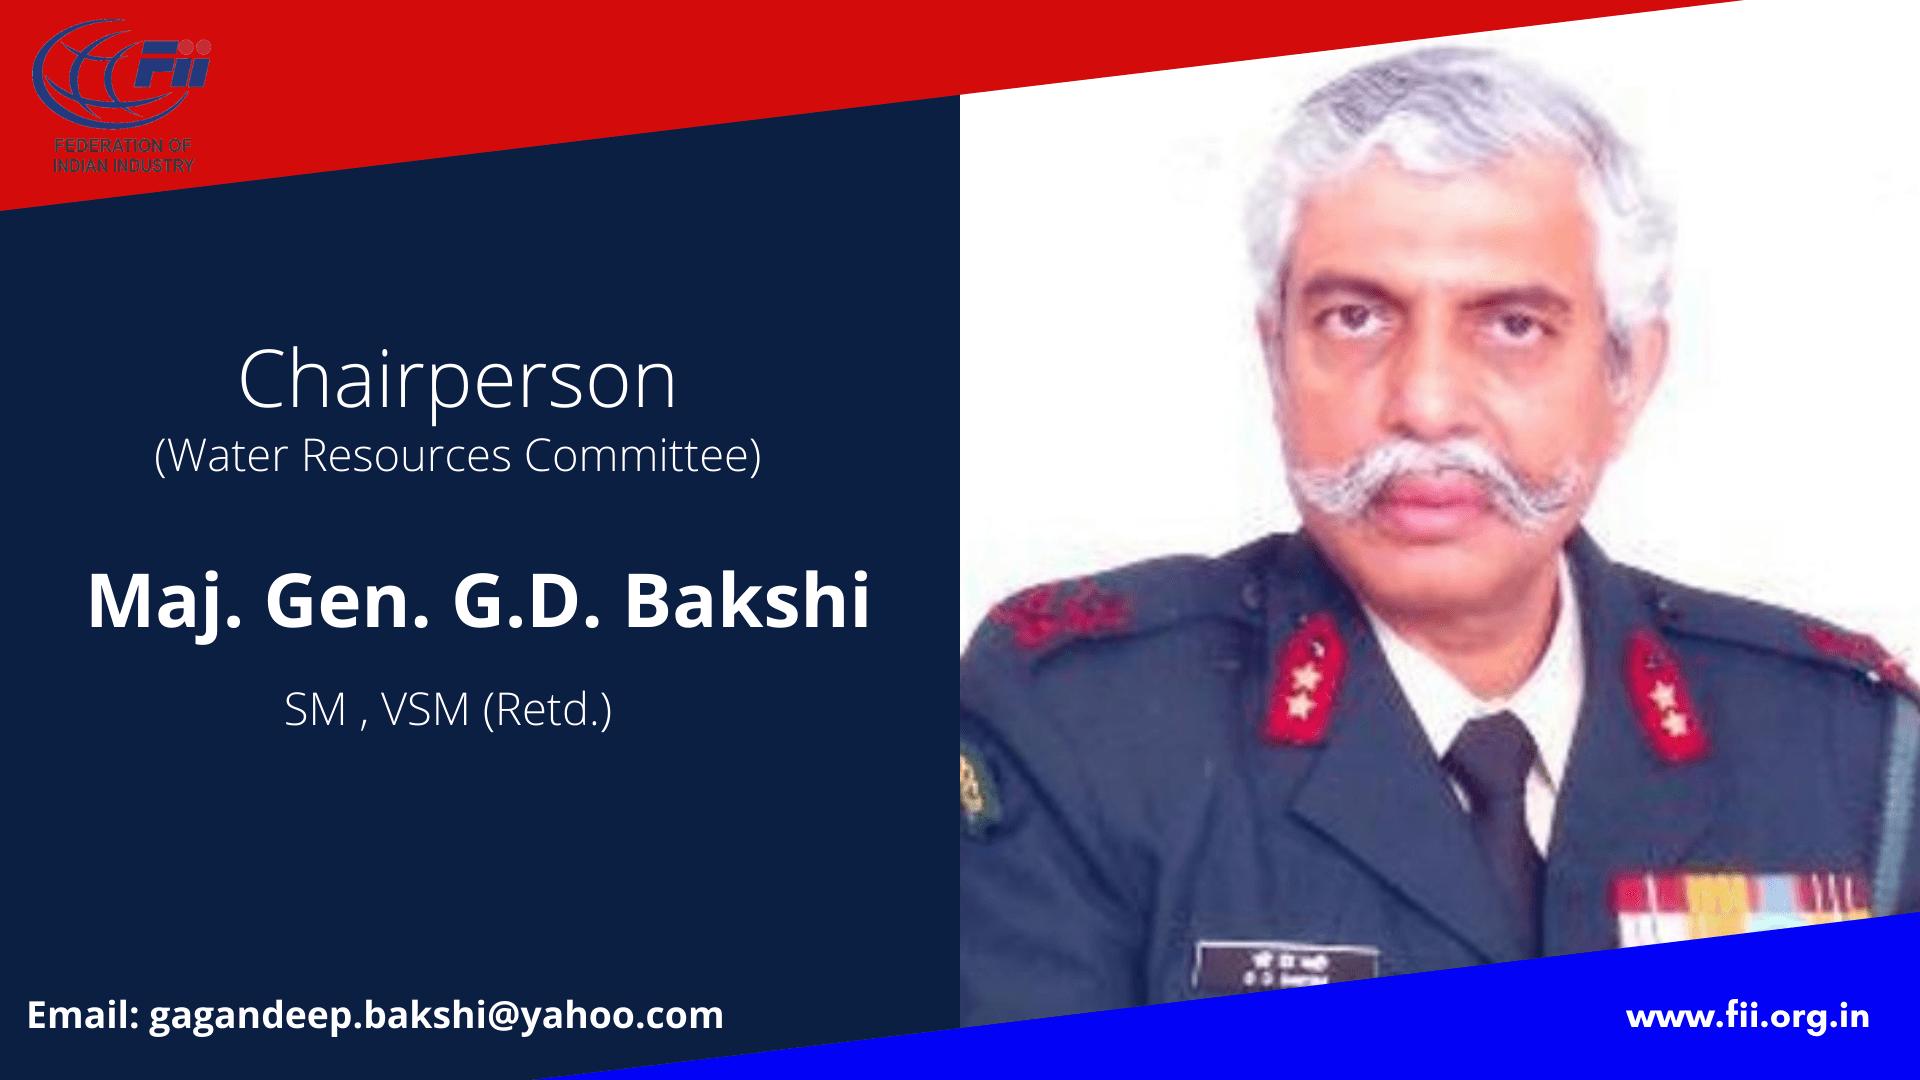 Maj. Gen G.D. Bakshi, Chairperson, Water Resources Committee